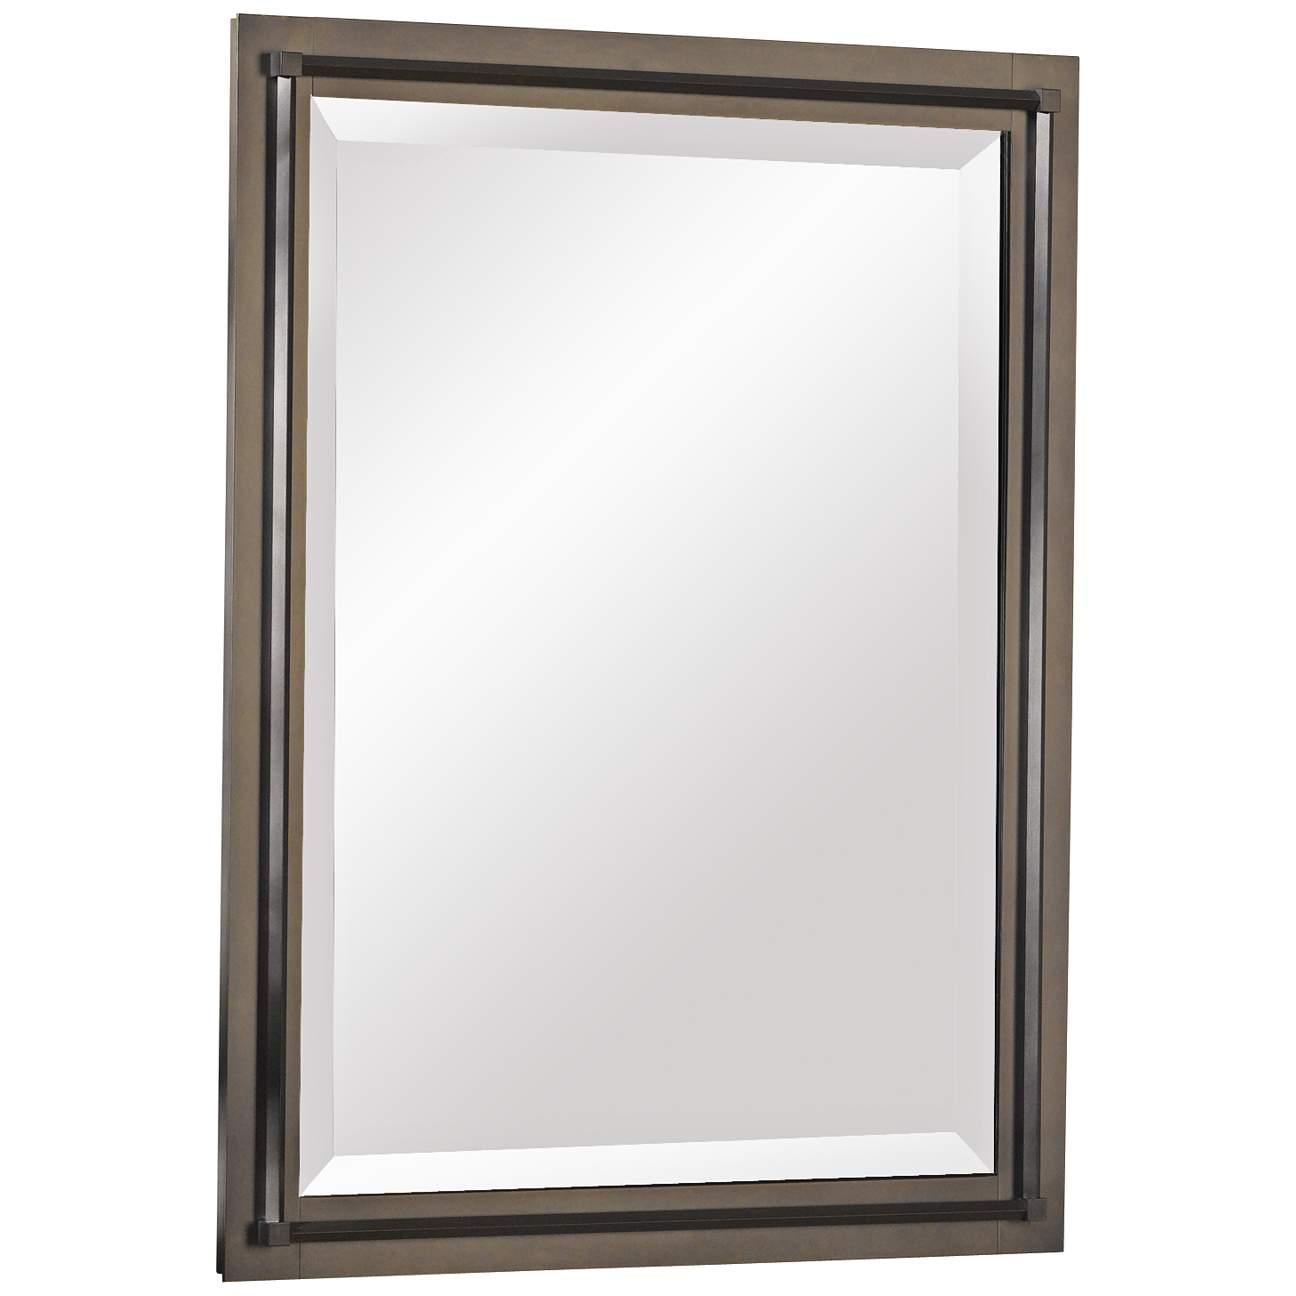 Zoom image